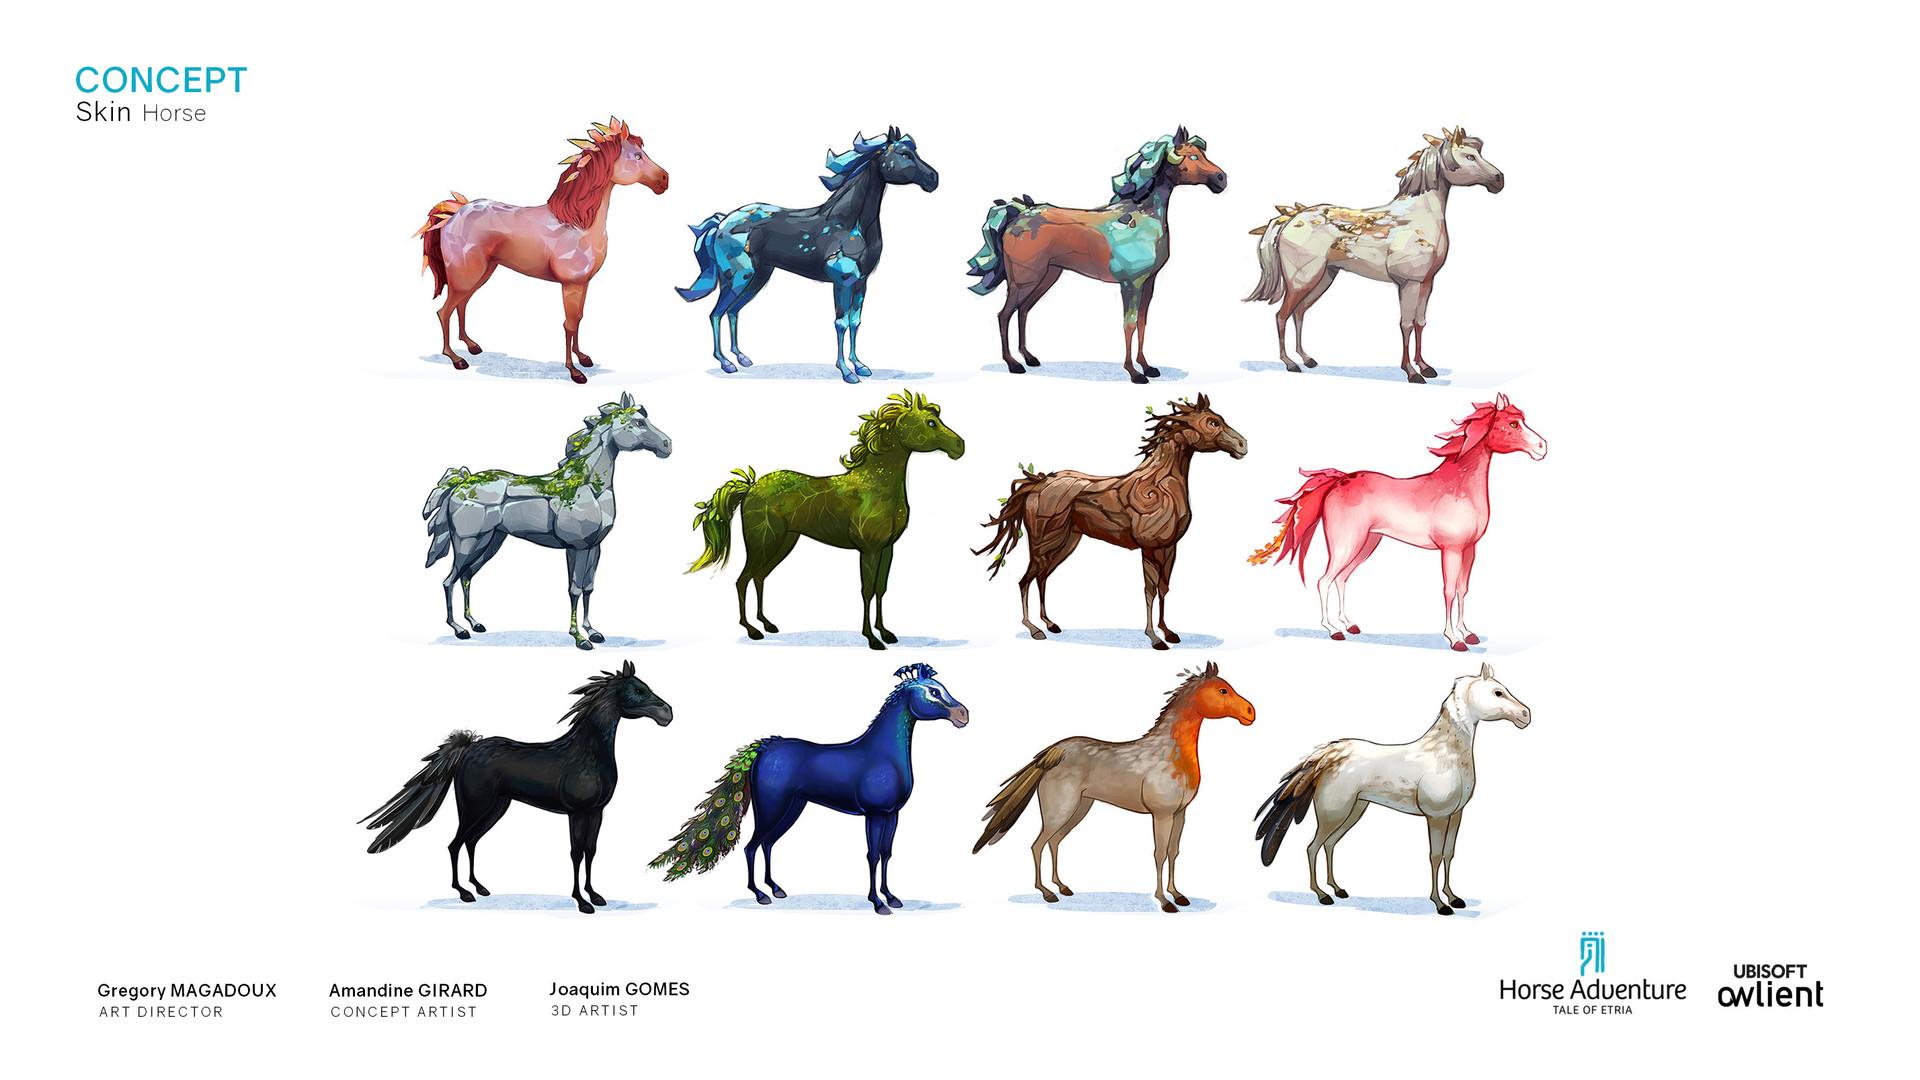 Koni amandine girard amandine girard koni horseadventure horse concept